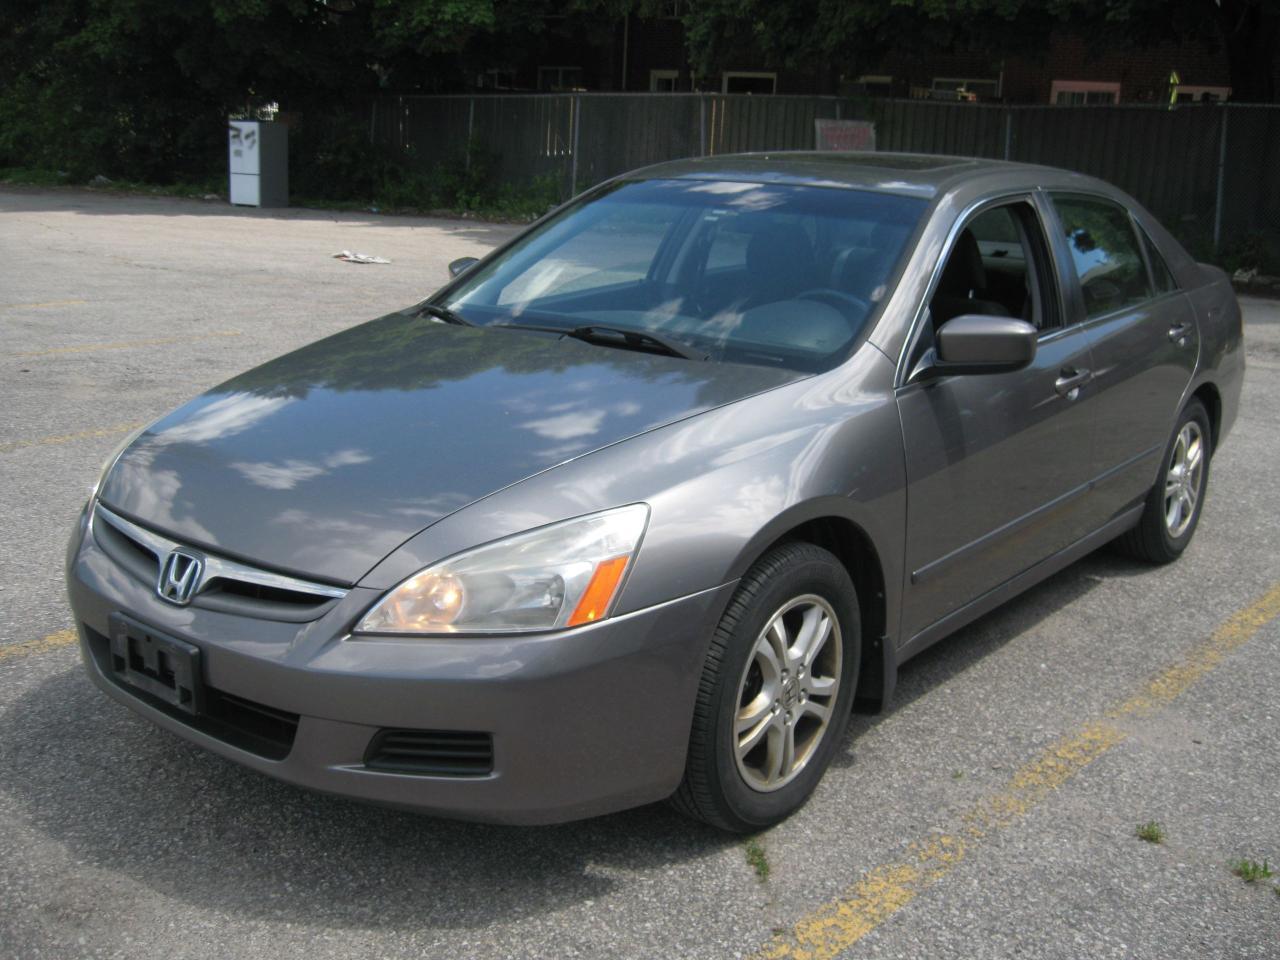 Photo of Gray 2006 Honda Accord